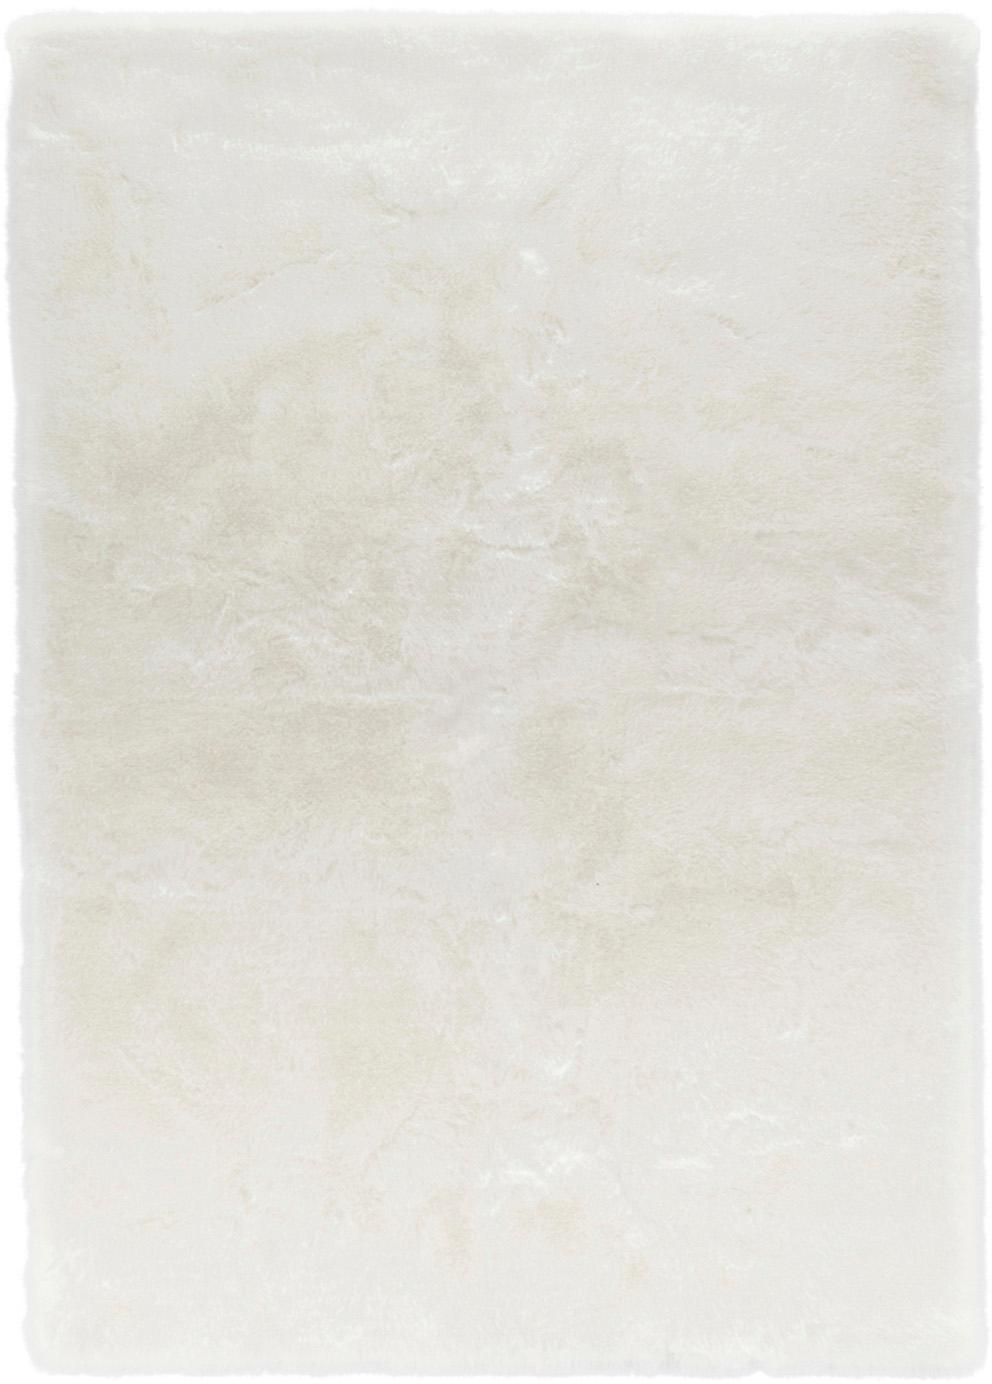 Flauschiger Hochflor-Teppich Superior aus Kunstfell, Flor: 95% Acryl, 5% Polyester, Weiß, B 180 x L 280 cm (Größe M)